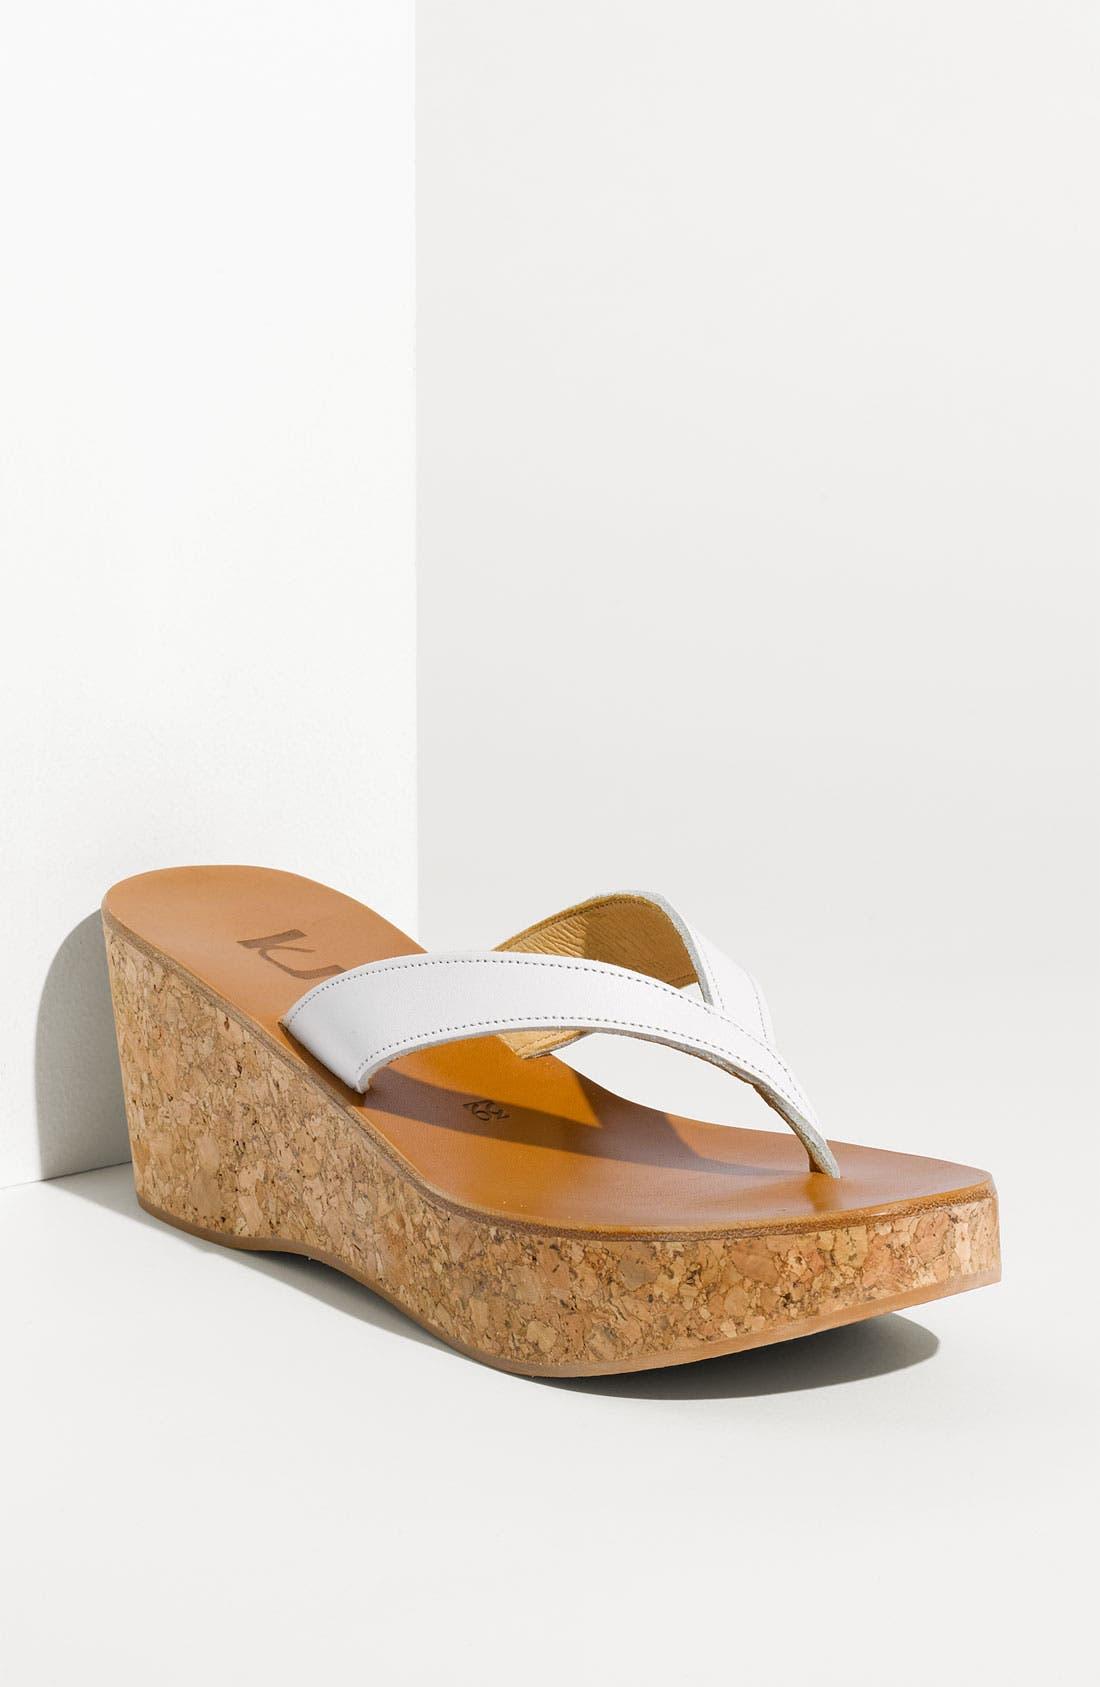 Main Image - K.Jacques St. Tropez 'Diorite' Wedge Sandal